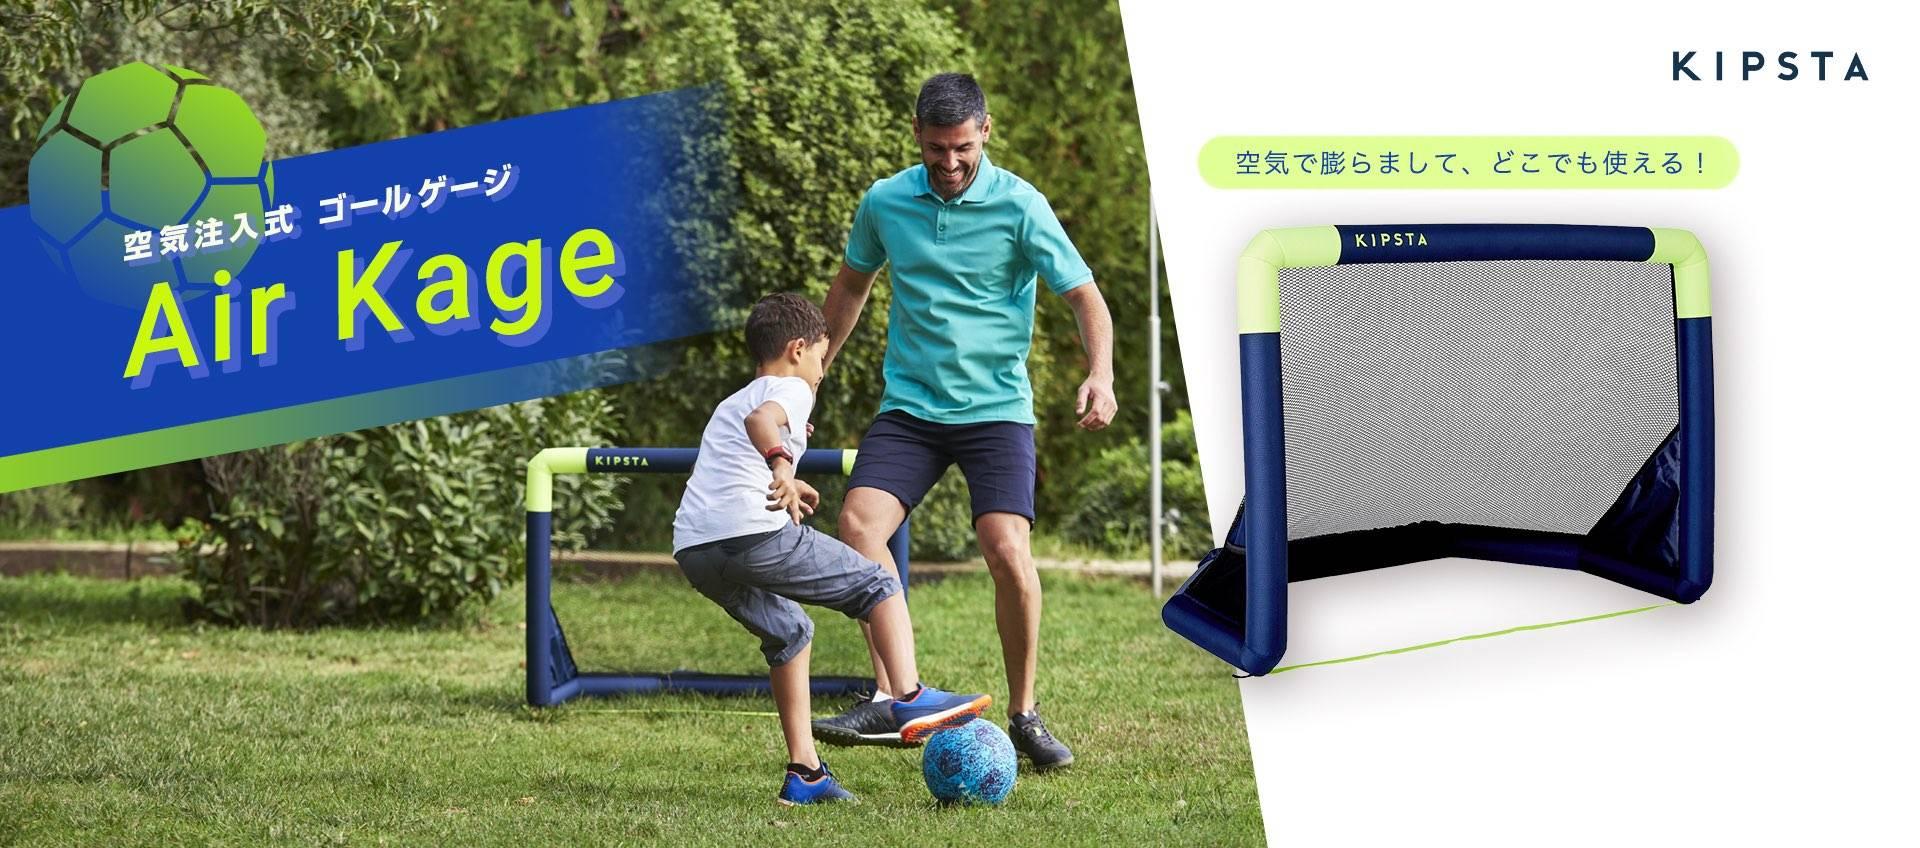 KIPSTA (キプスタ) サッカー 空気注入式 ゴールケージ Air Kage